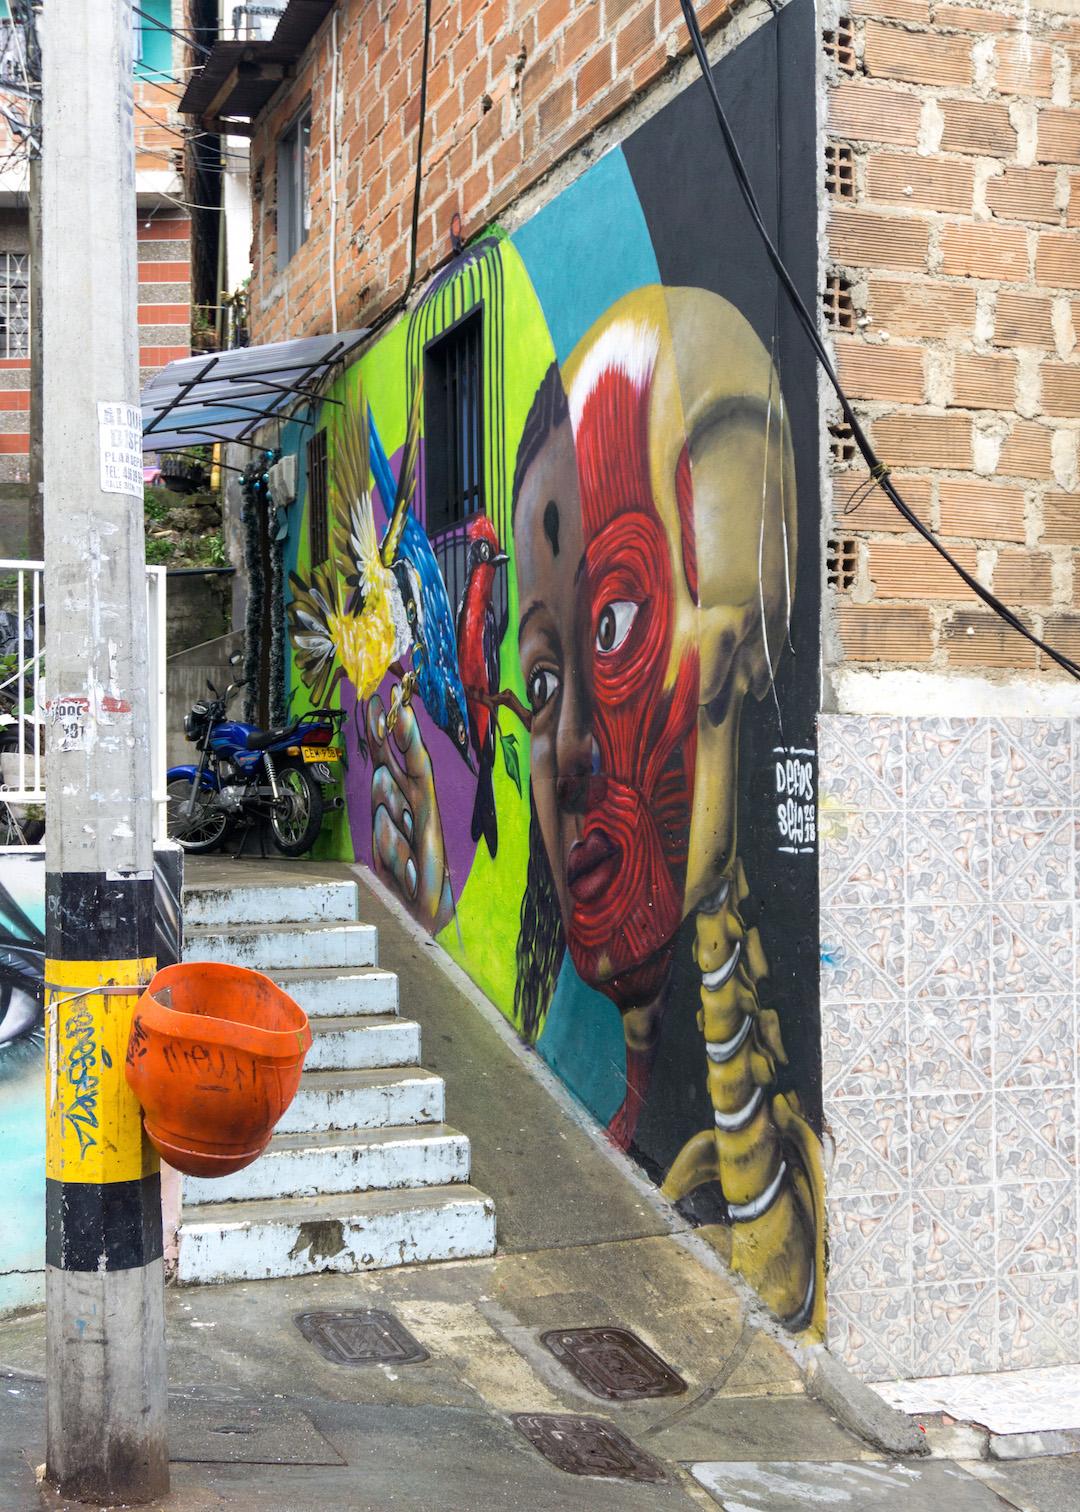 Her_Travel_Edit_Communa_13_Medellin_Street